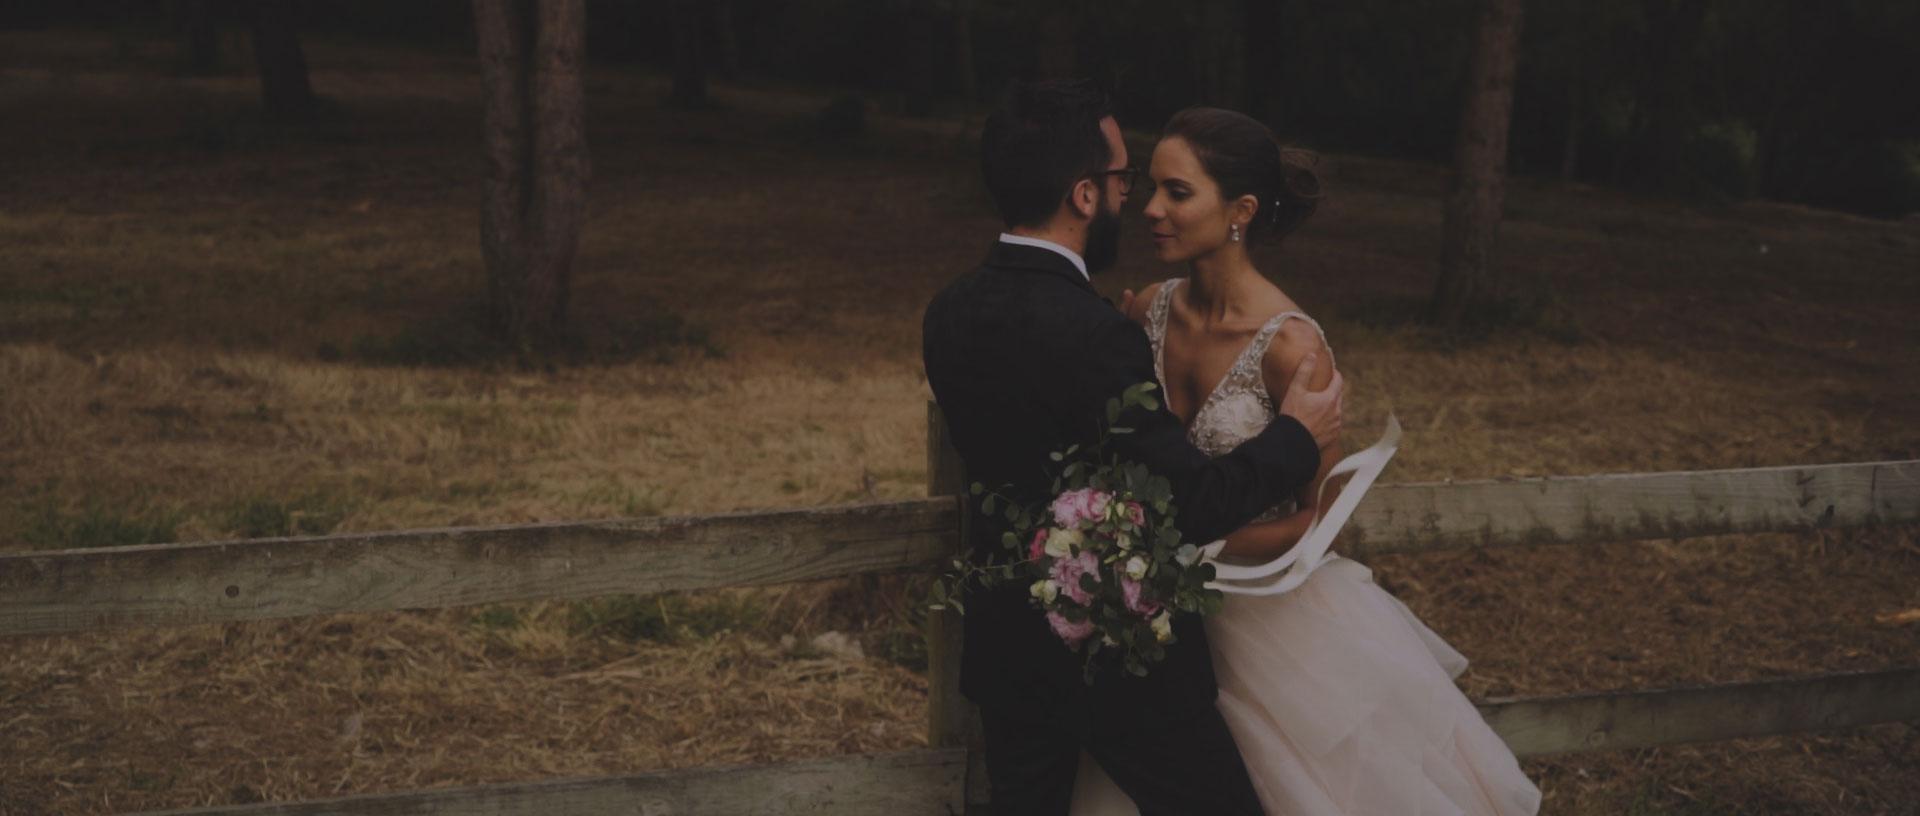 Cláudia & Fábio - Wedding